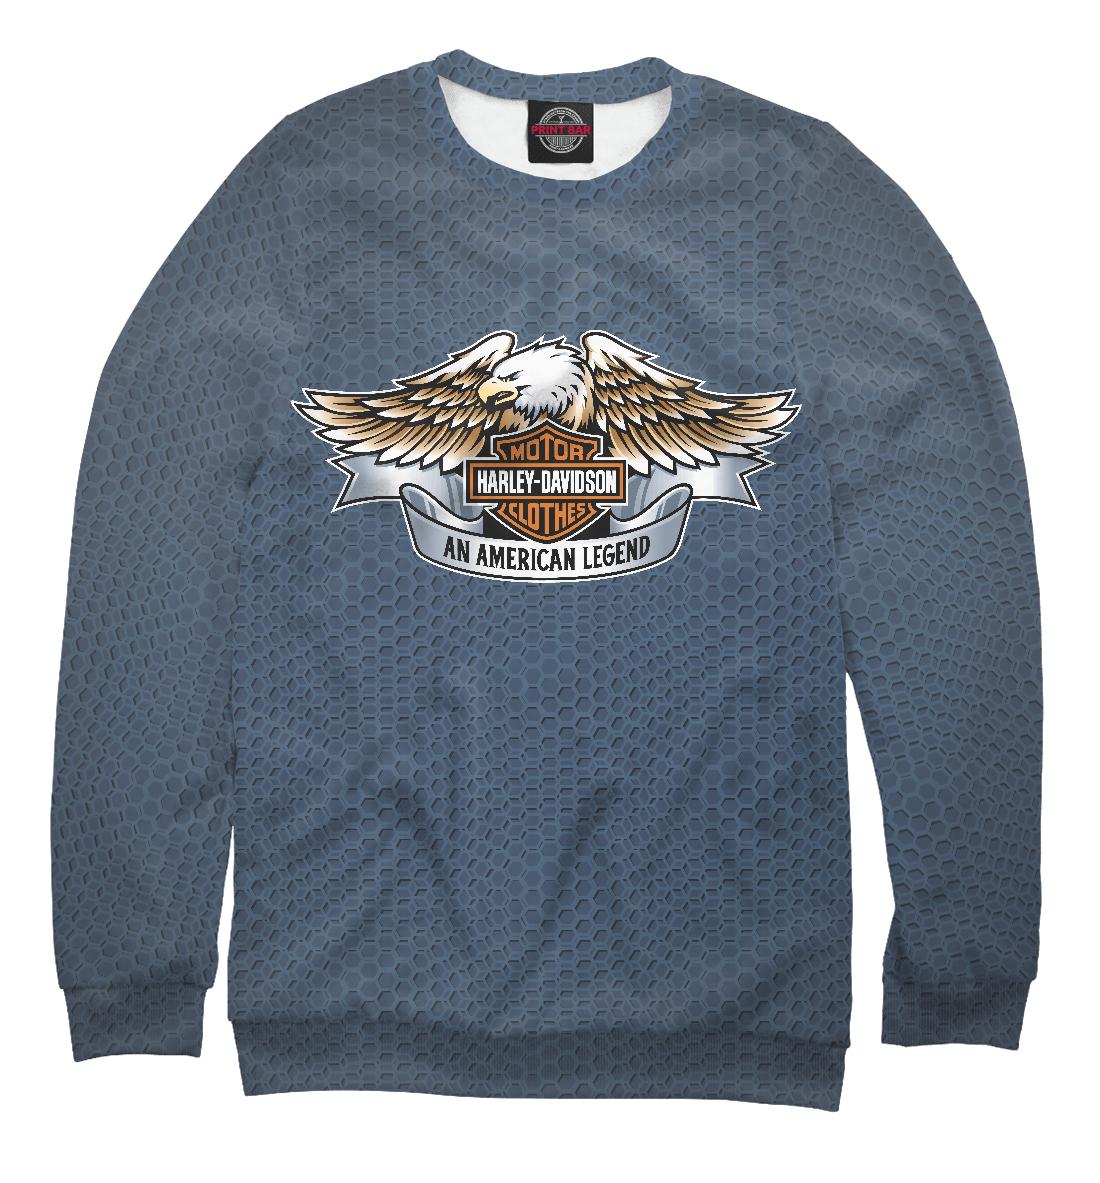 Купить Harley-Davidson An American Legend, Printbar, Свитшоты, HRD-921753-swi-1